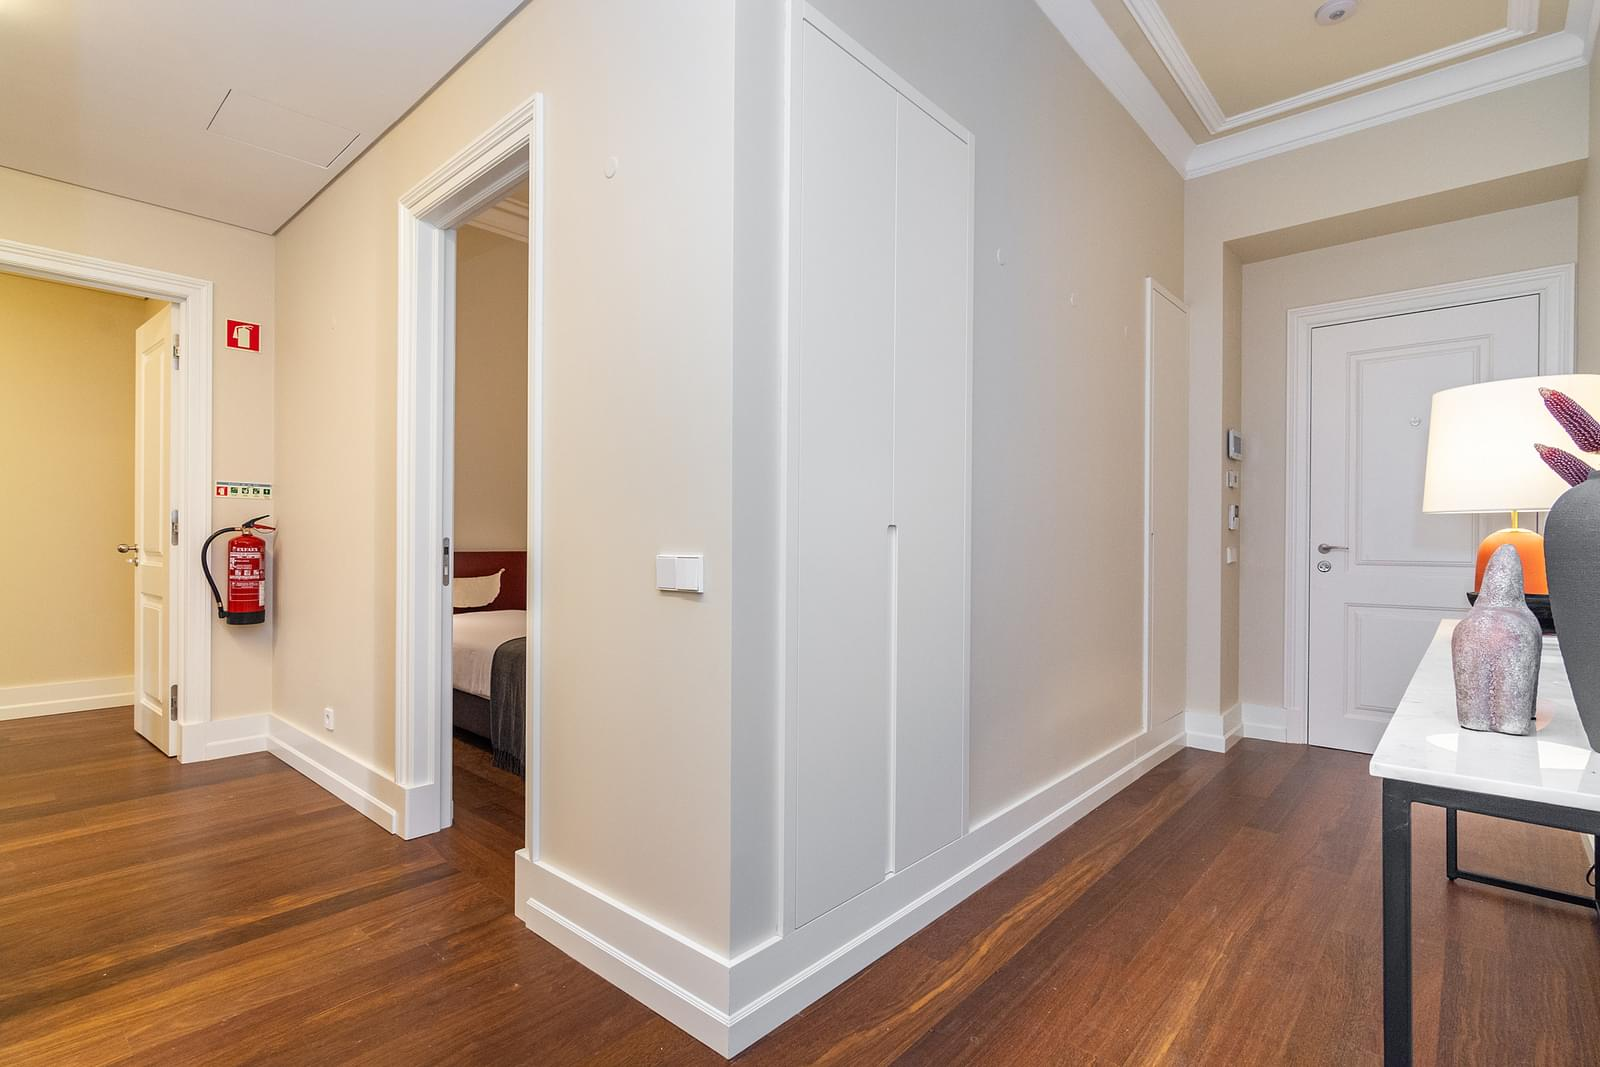 pf19003-apartamento-t2-lisboa-b1ecfff9-2e07-4478-bfa5-1ae1a3f98d4b